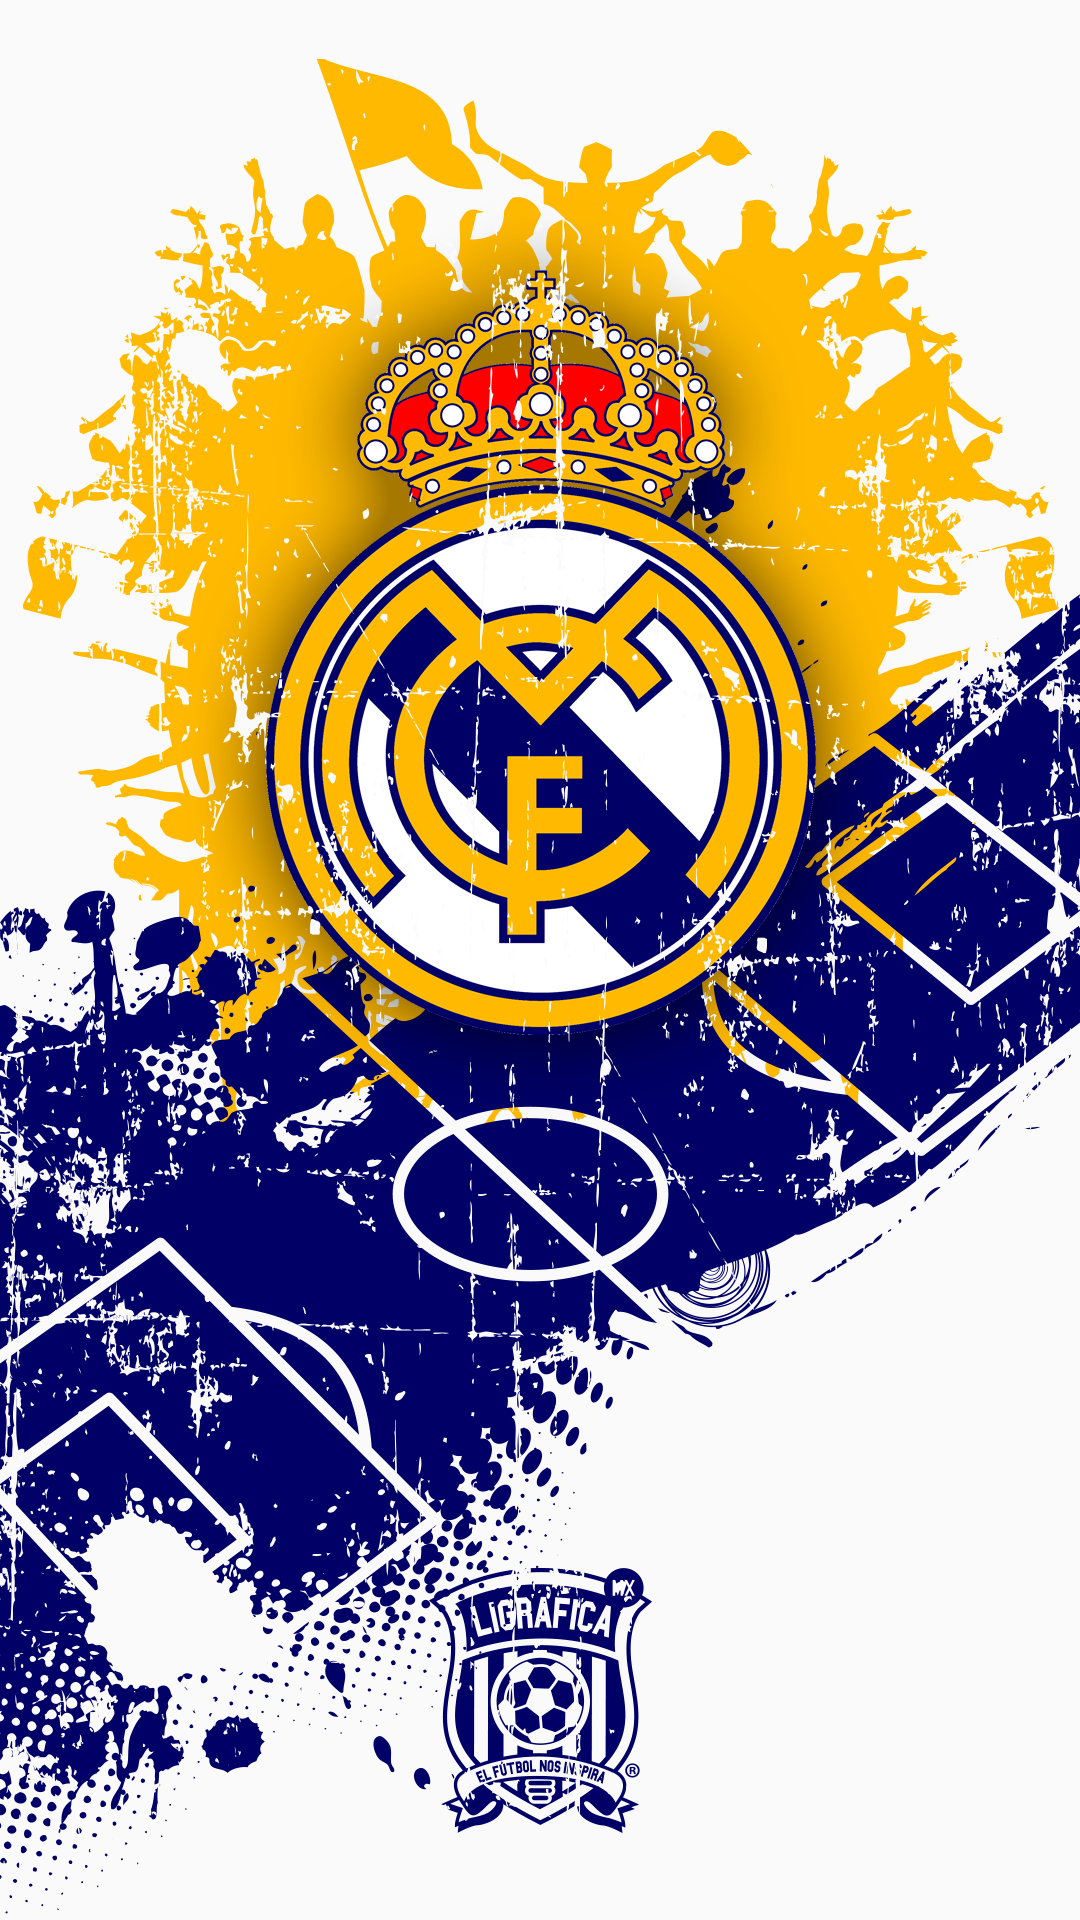 Ligraficamx 14 04 15ctg Gambar Sepak Bola Sepak Bola Wallpaper Ponsel